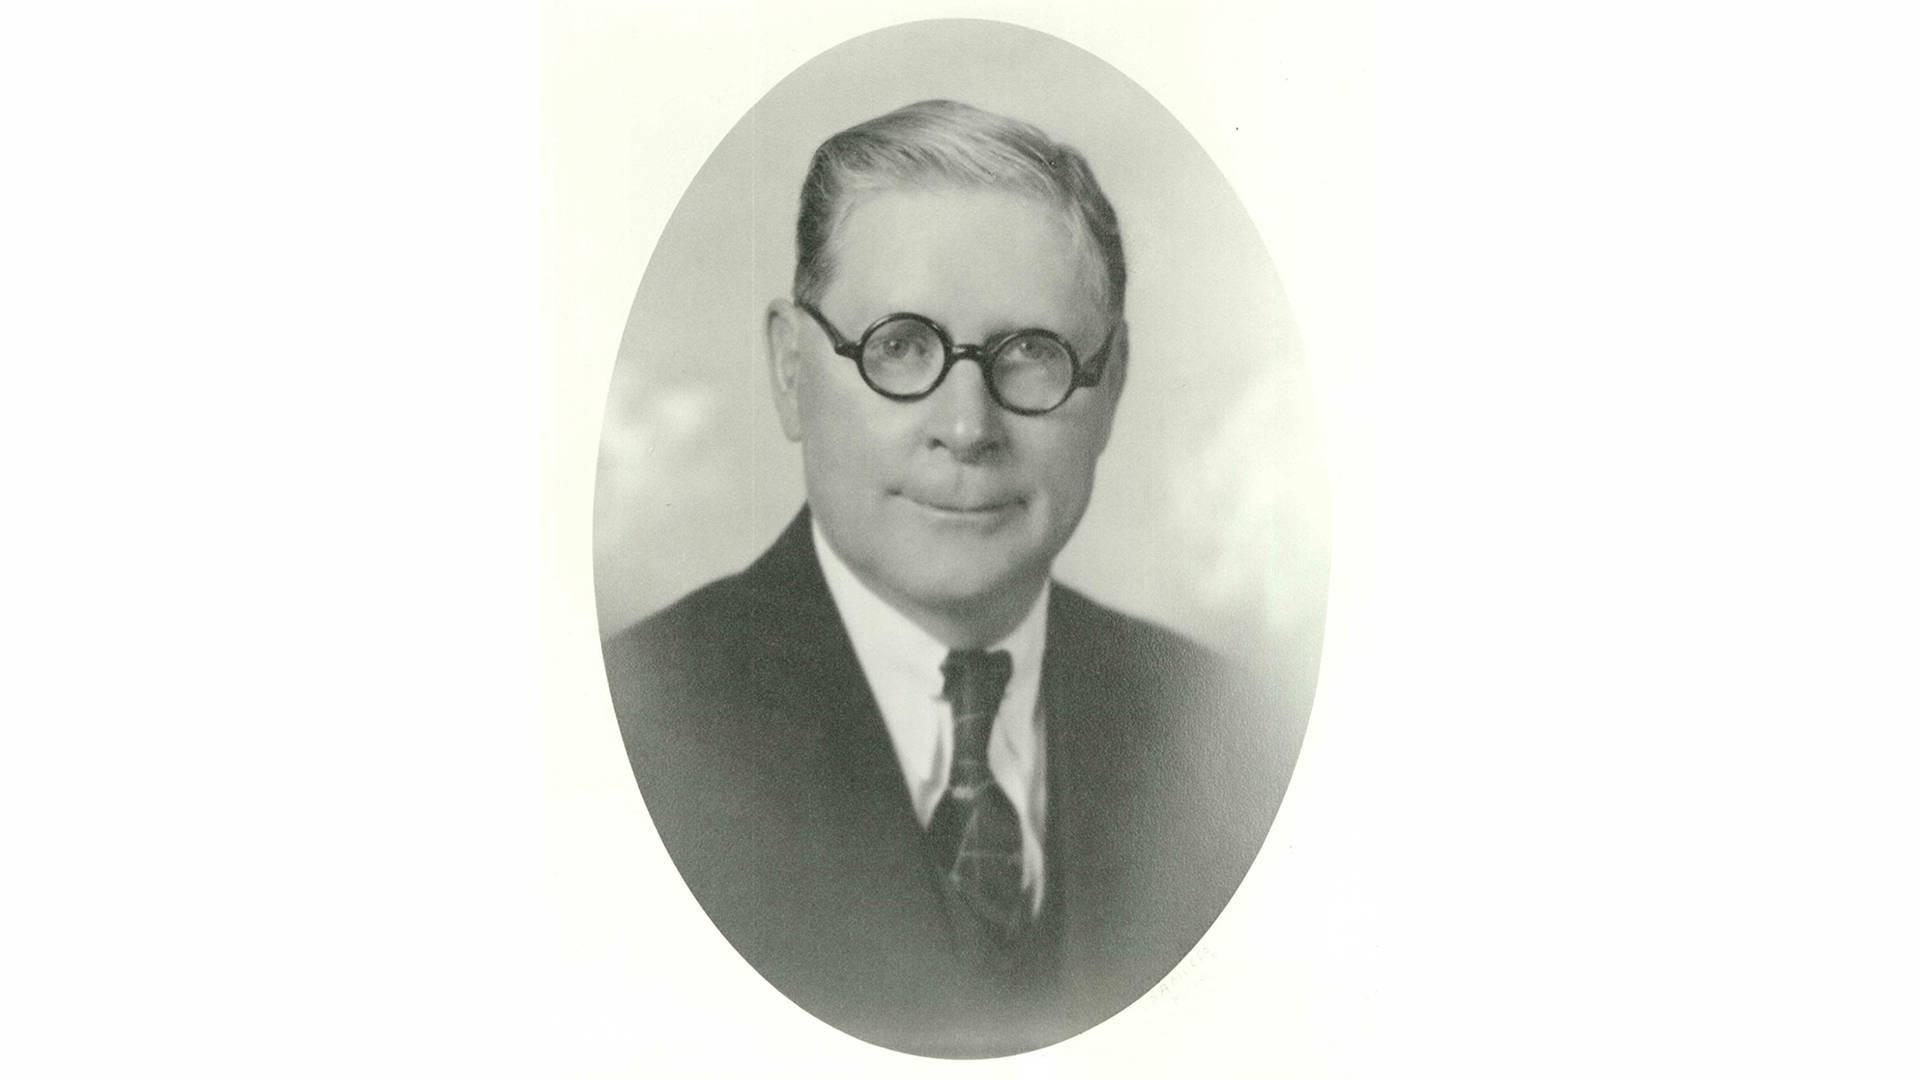 Doctor Frank S. Howe